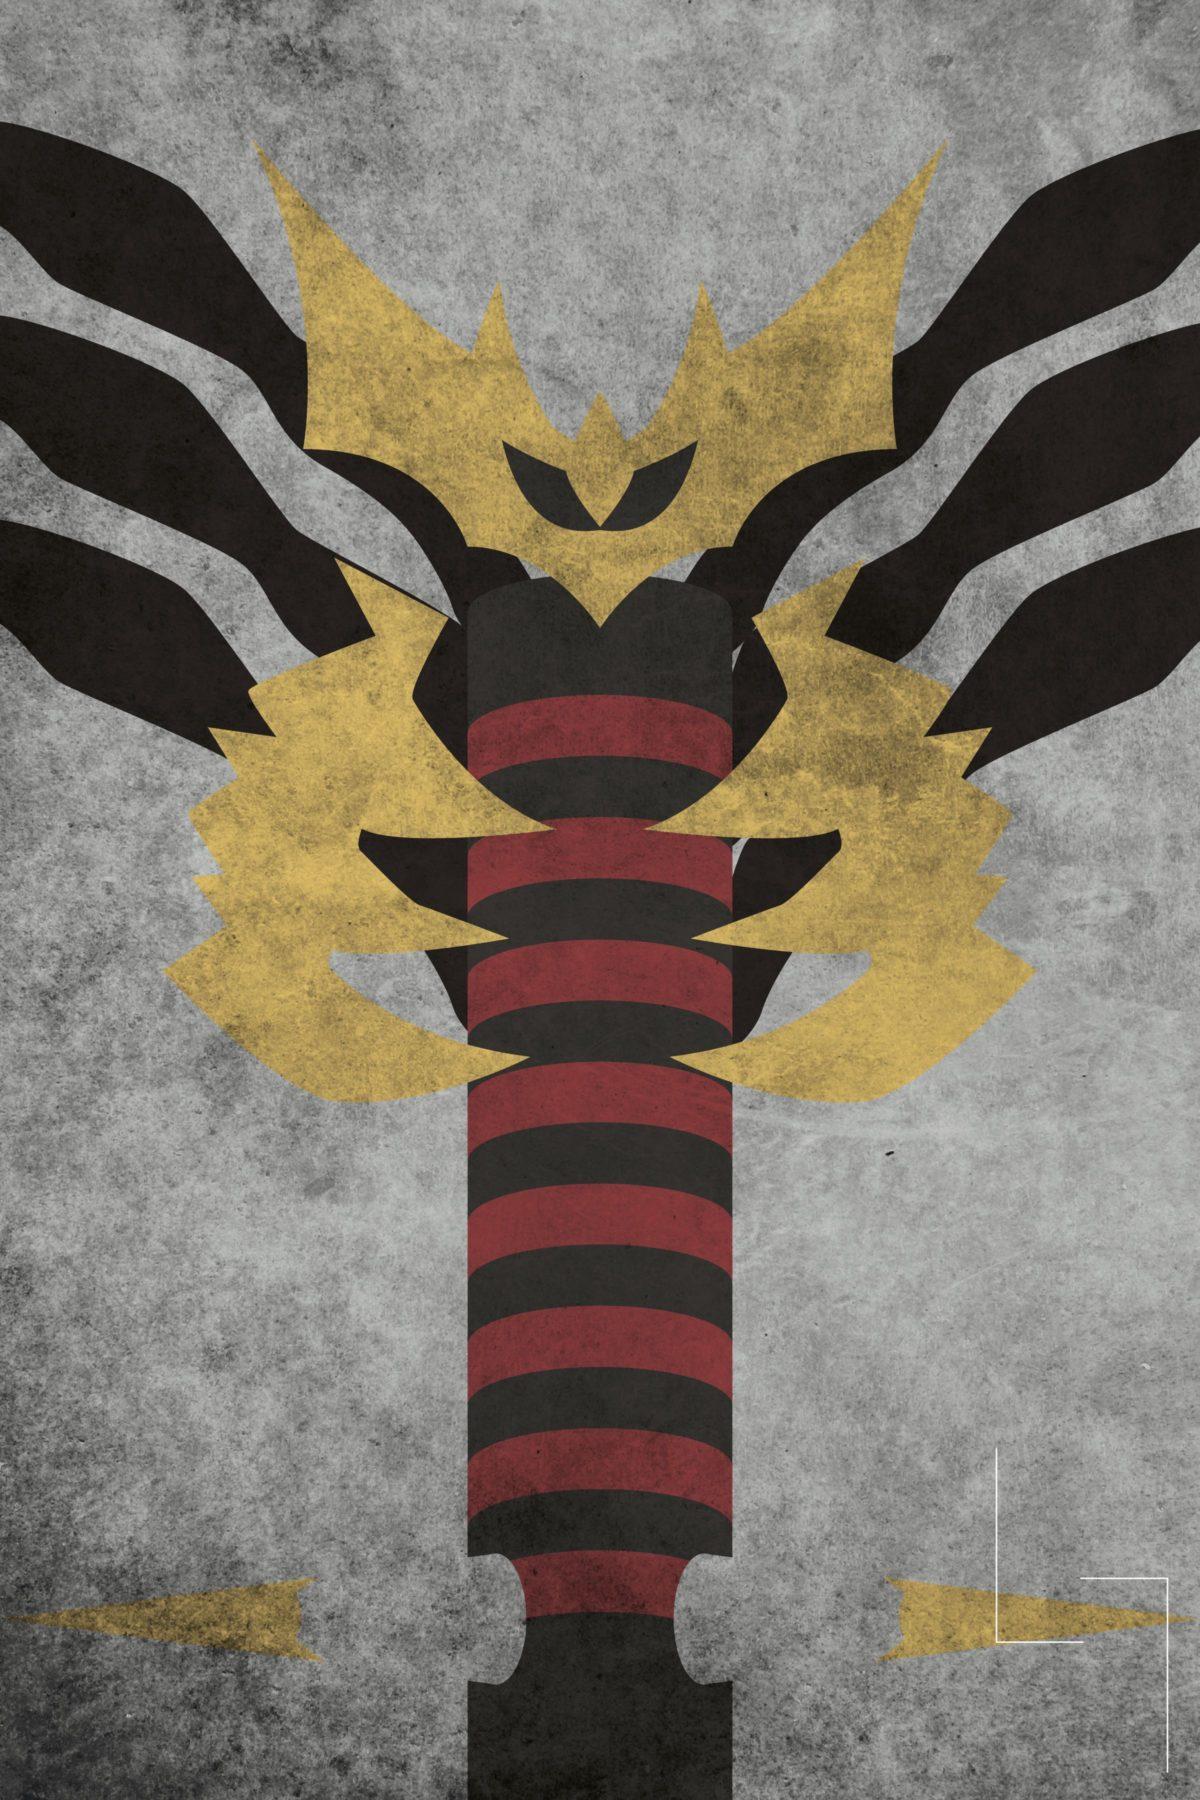 Giratina Origin Forme | Pokémon | Pinterest | Pokémon, Anime and Dbz